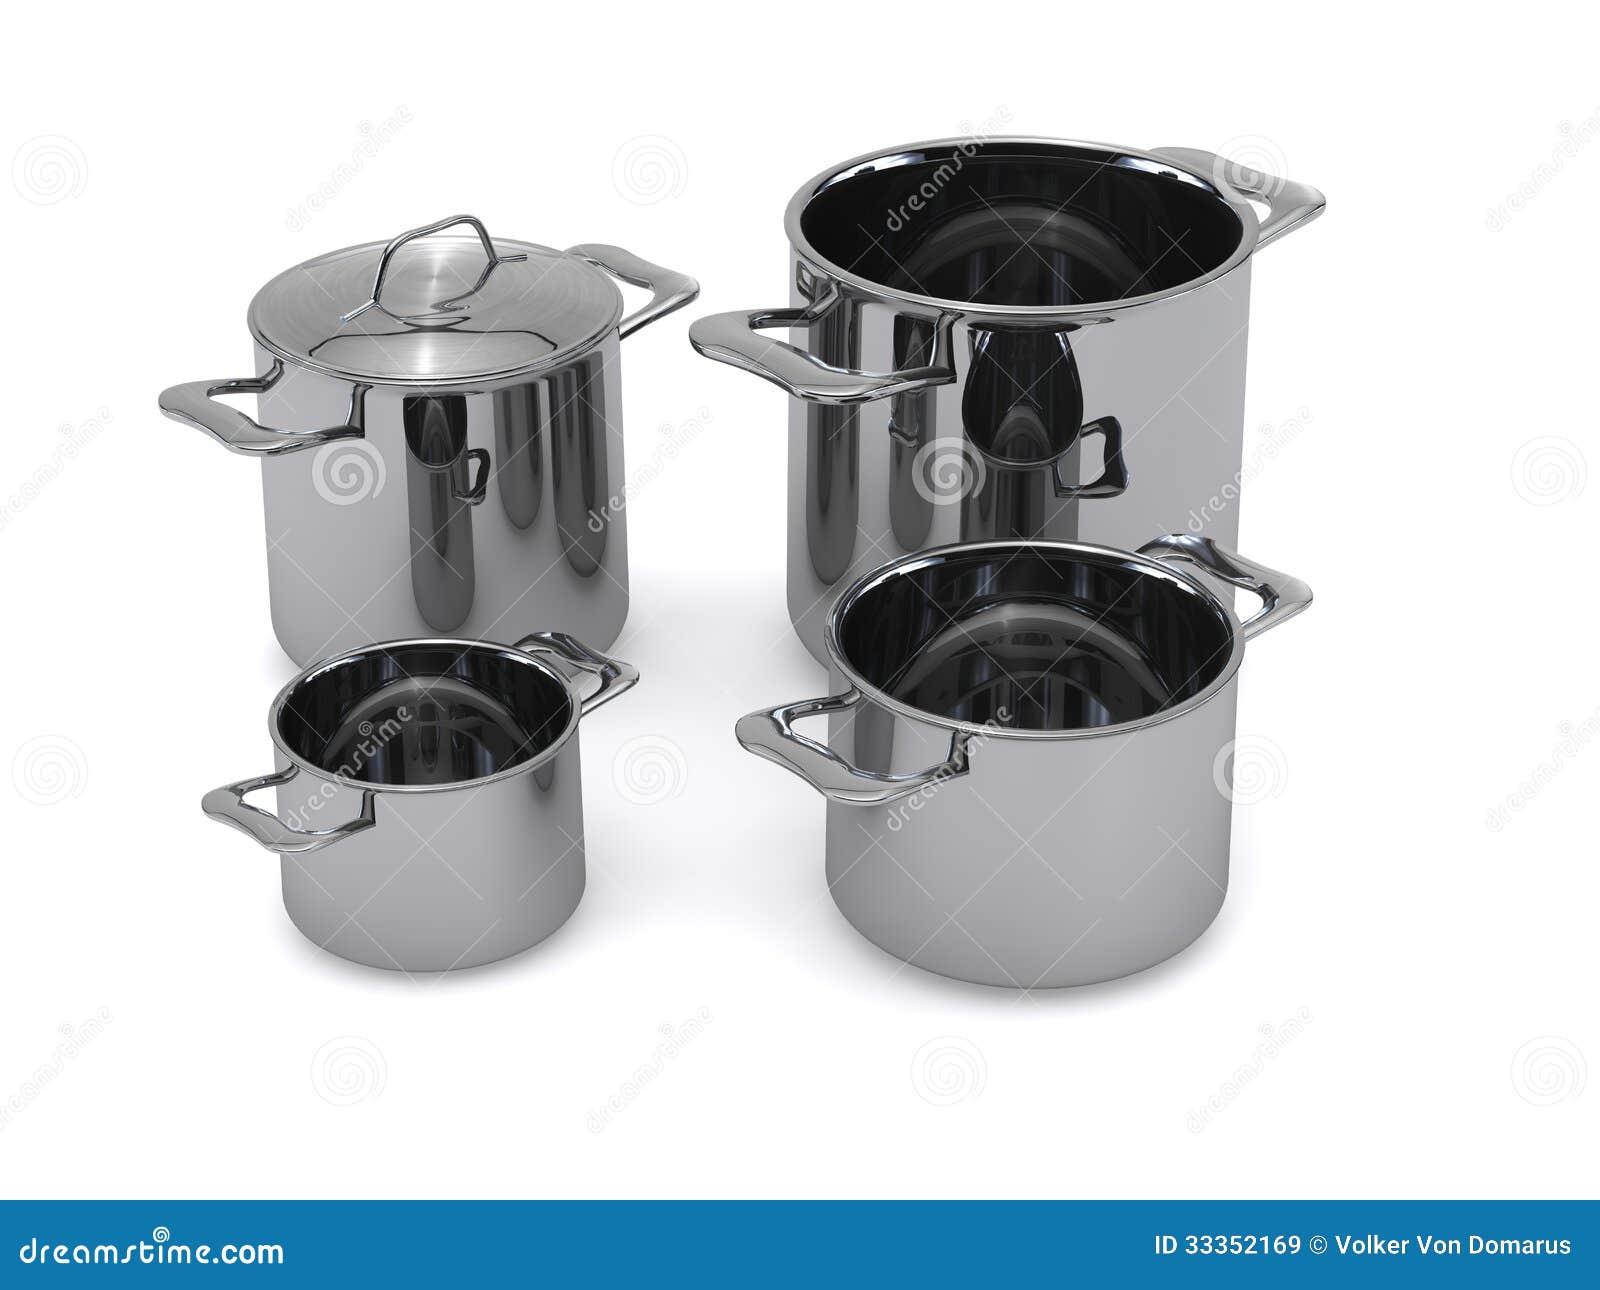 steel pots and pans royalty free stock images image 33352169. Black Bedroom Furniture Sets. Home Design Ideas